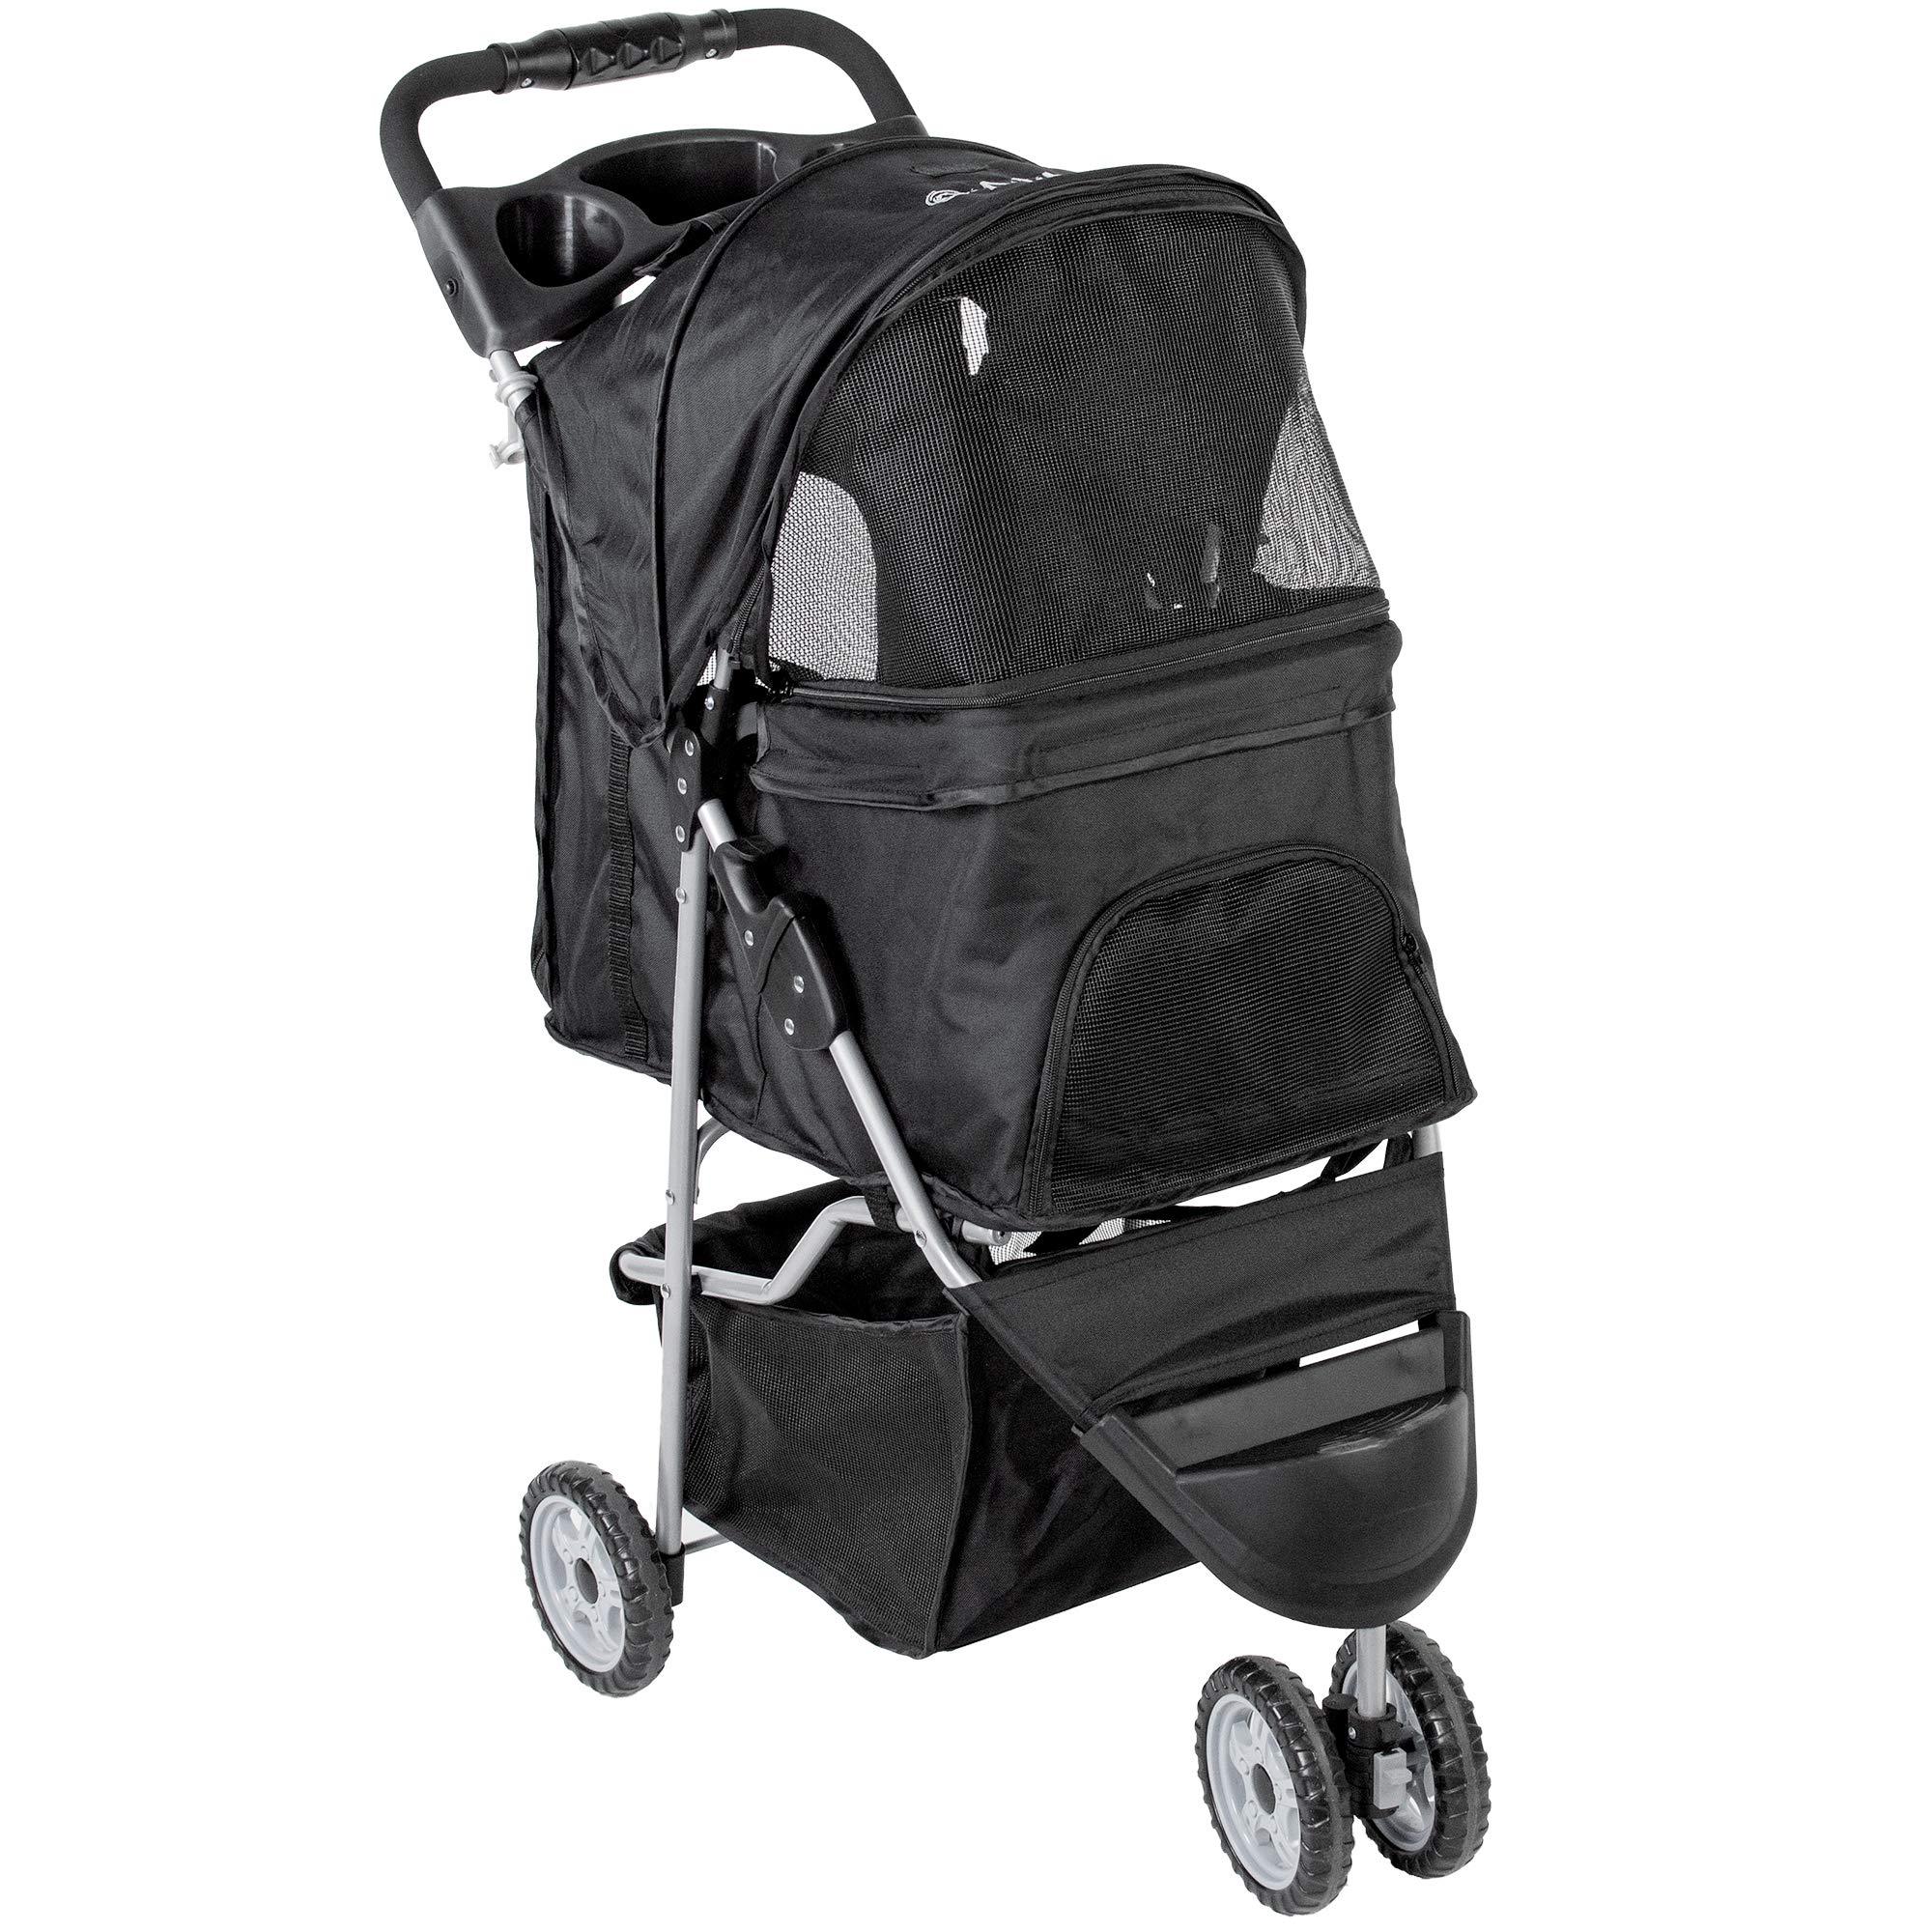 VIVO Black 3 Wheel Pet Stroller for Cat, Dog and More, Foldable Carrier Strolling Cart (STROLR-V003K) by VIVO